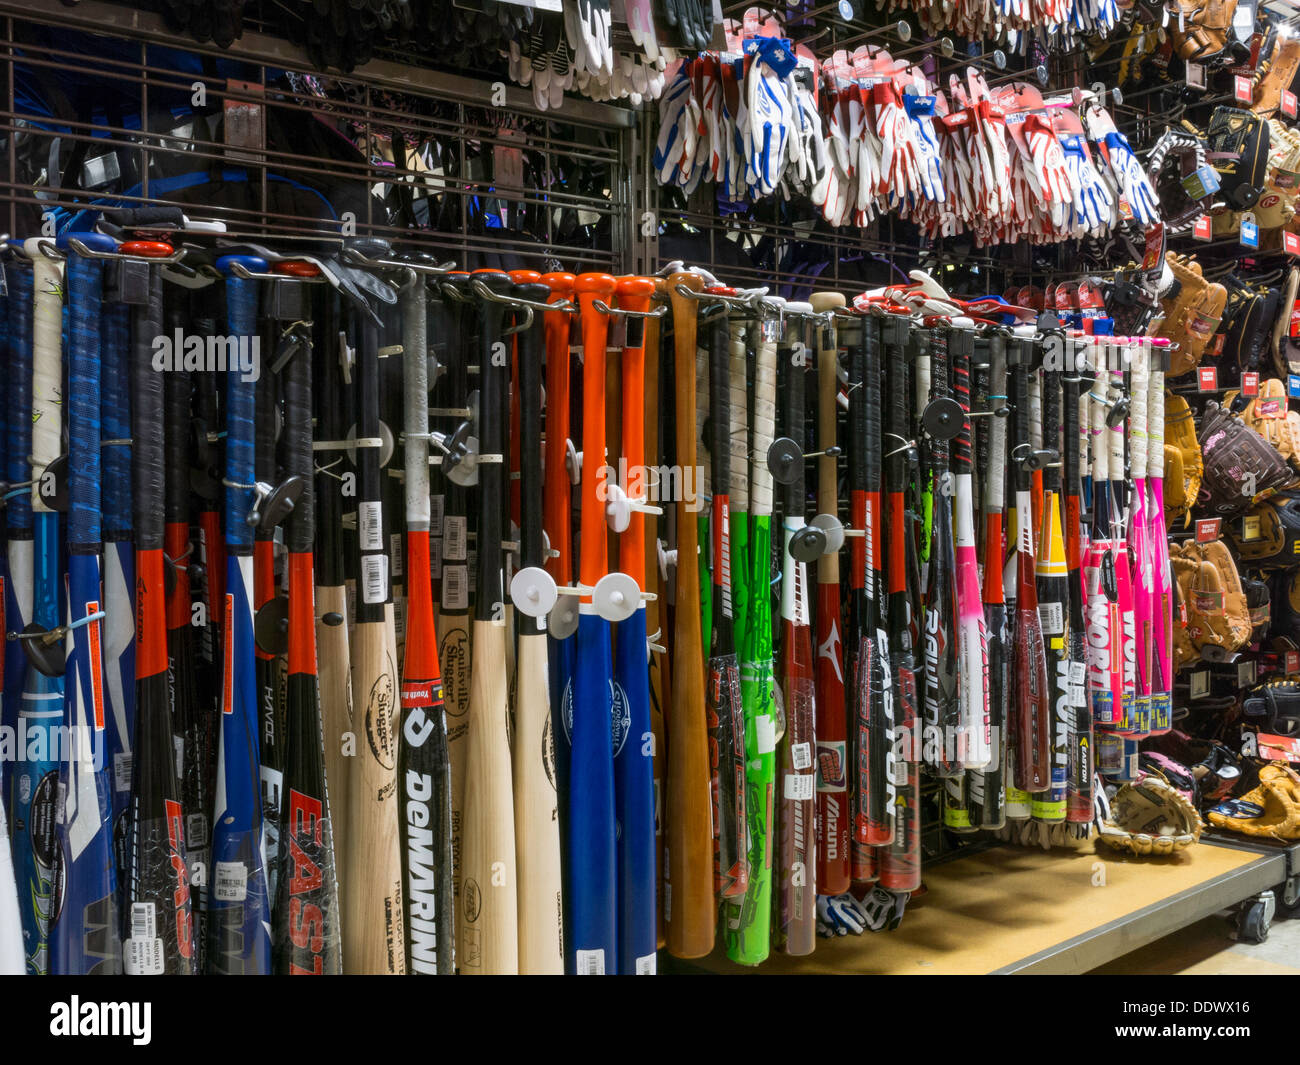 Sporting Goods Equipment ~ Baseball bats in modell s sporting goods store nyc stock